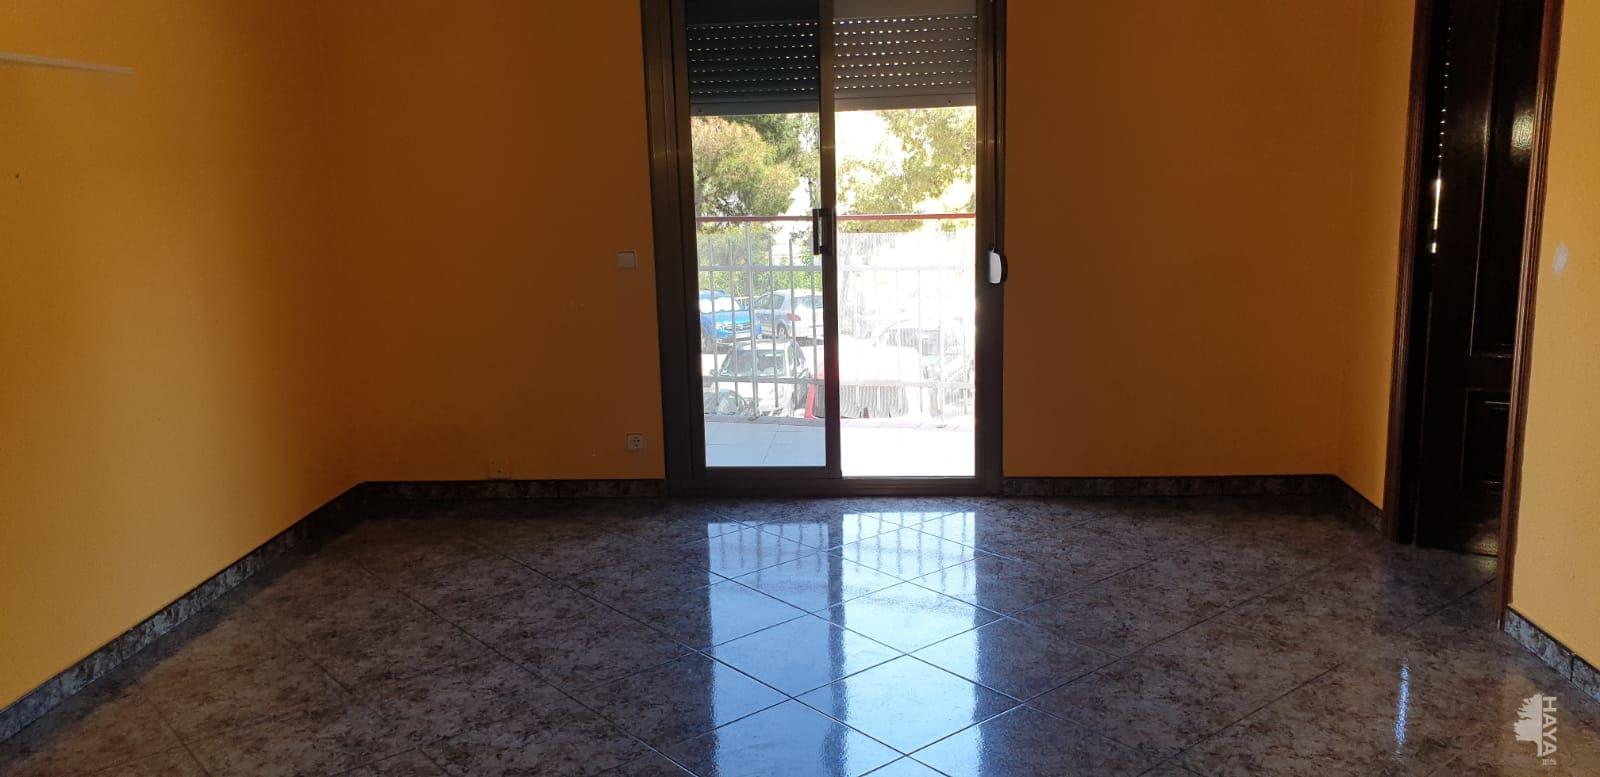 Piso en venta en Vilanova I la Geltrú, Barcelona, Avenida Francesc Macia, 139.099 €, 3 habitaciones, 1 baño, 60 m2